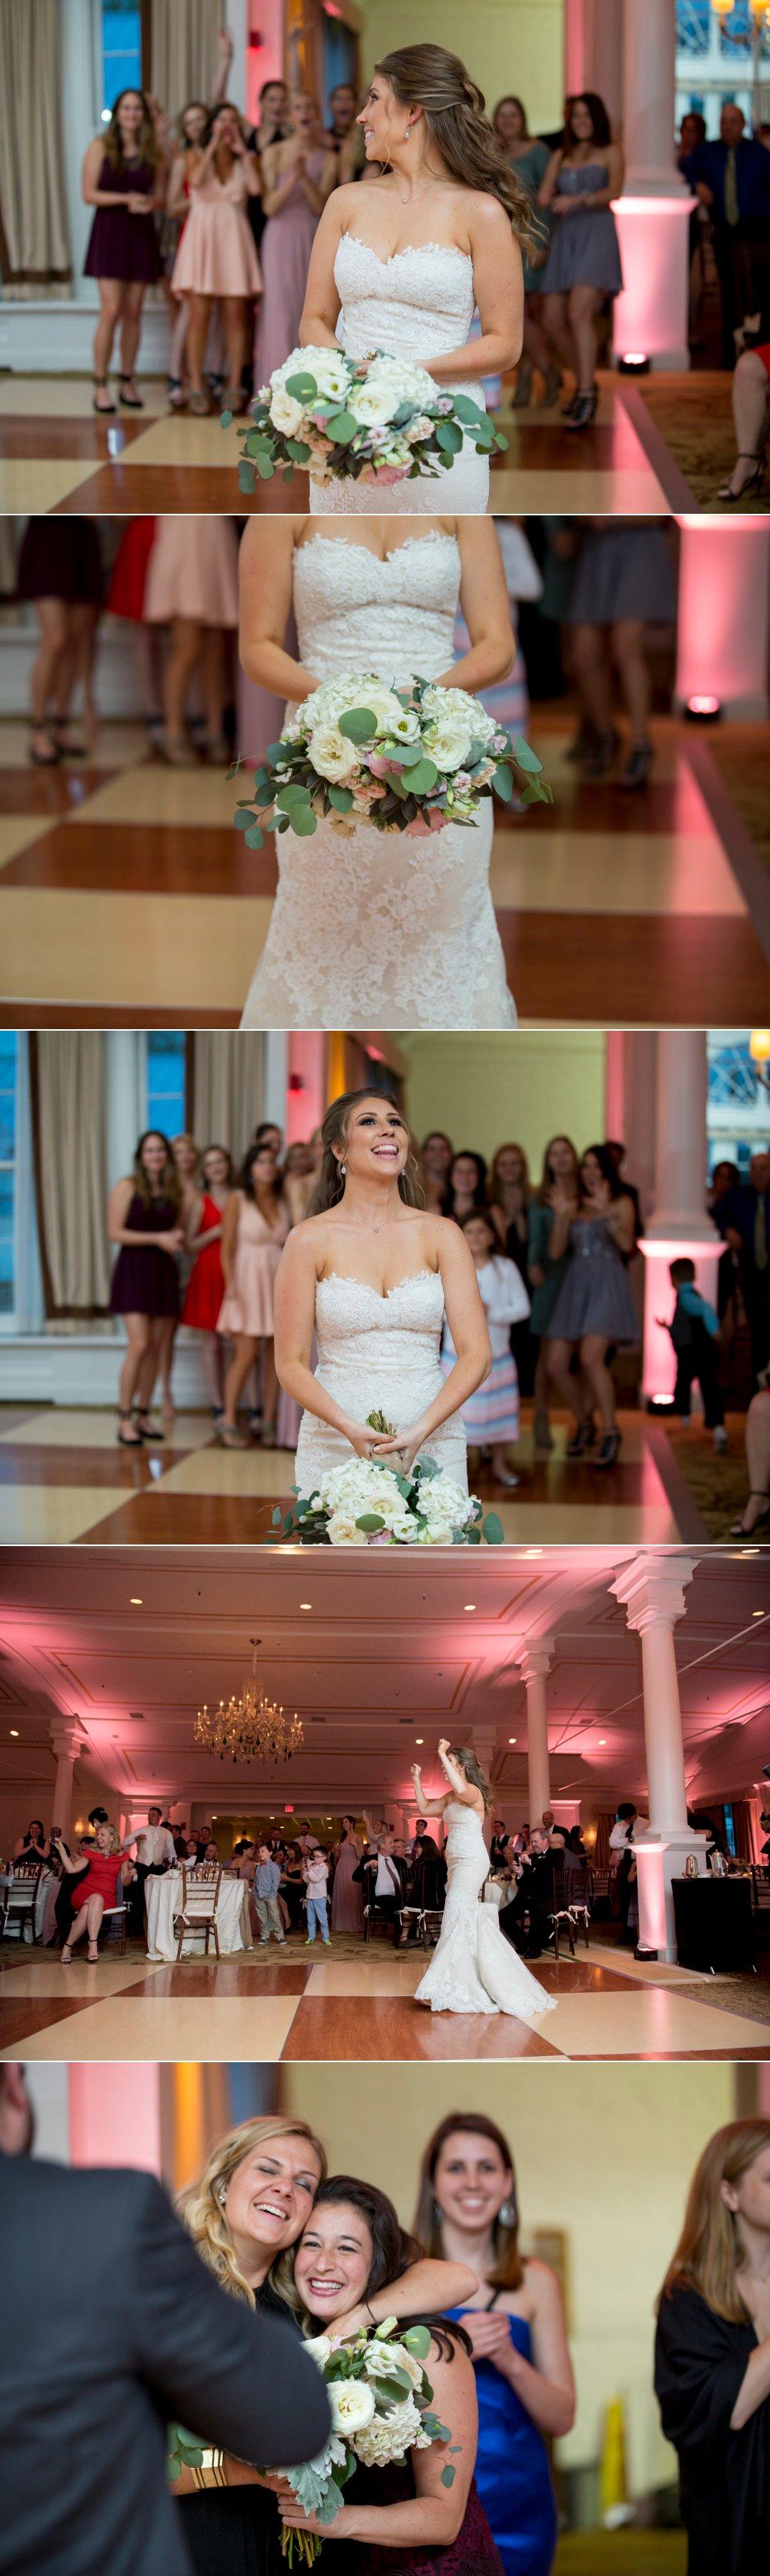 SomerbyJonesPhotography_EquinoxVermont_Wedding_0055.jpg